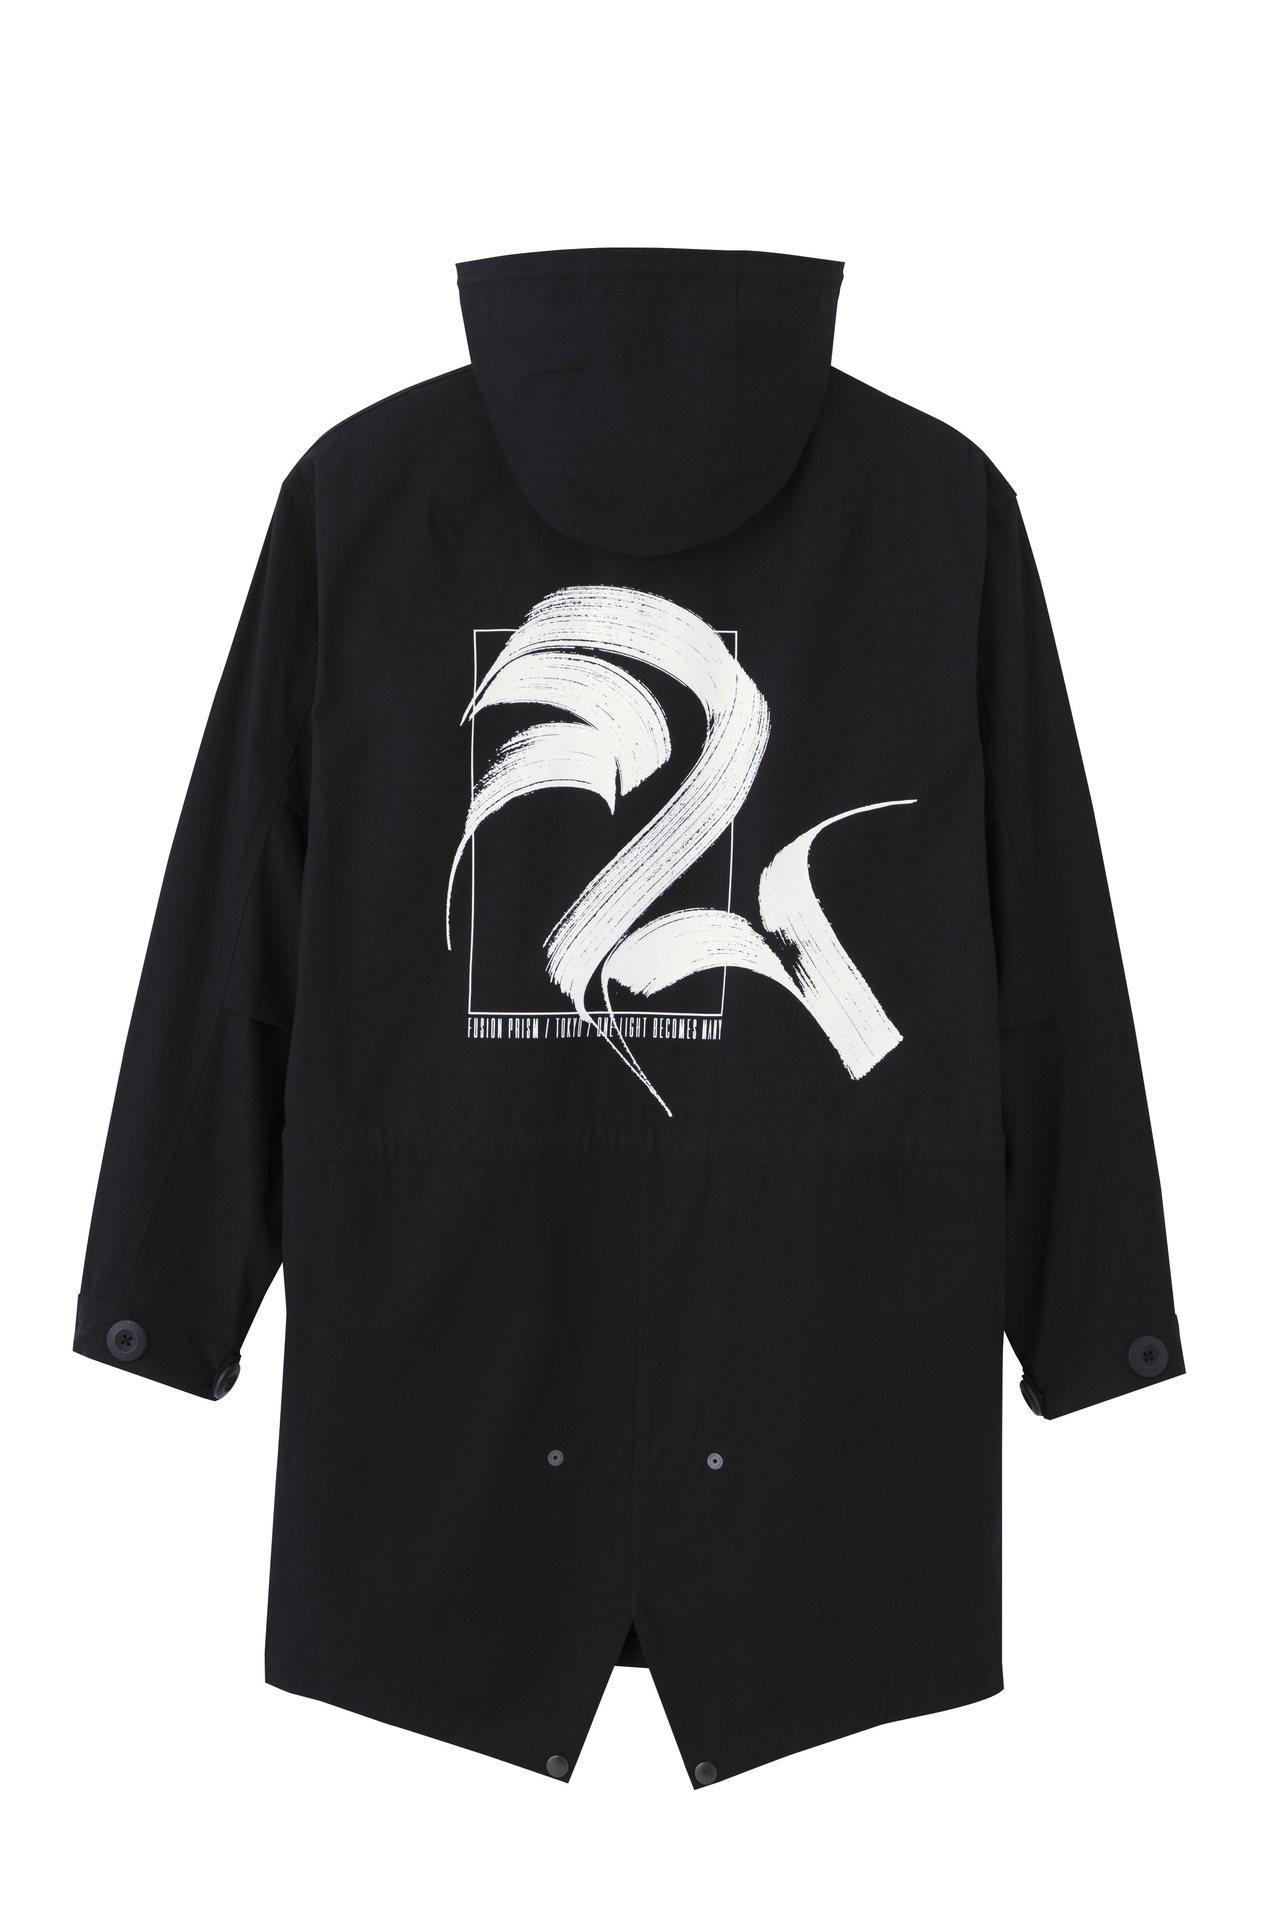 GU「HYBRID TOKYO」系列寬版軍裝大衣,1,490元。圖/GU提供